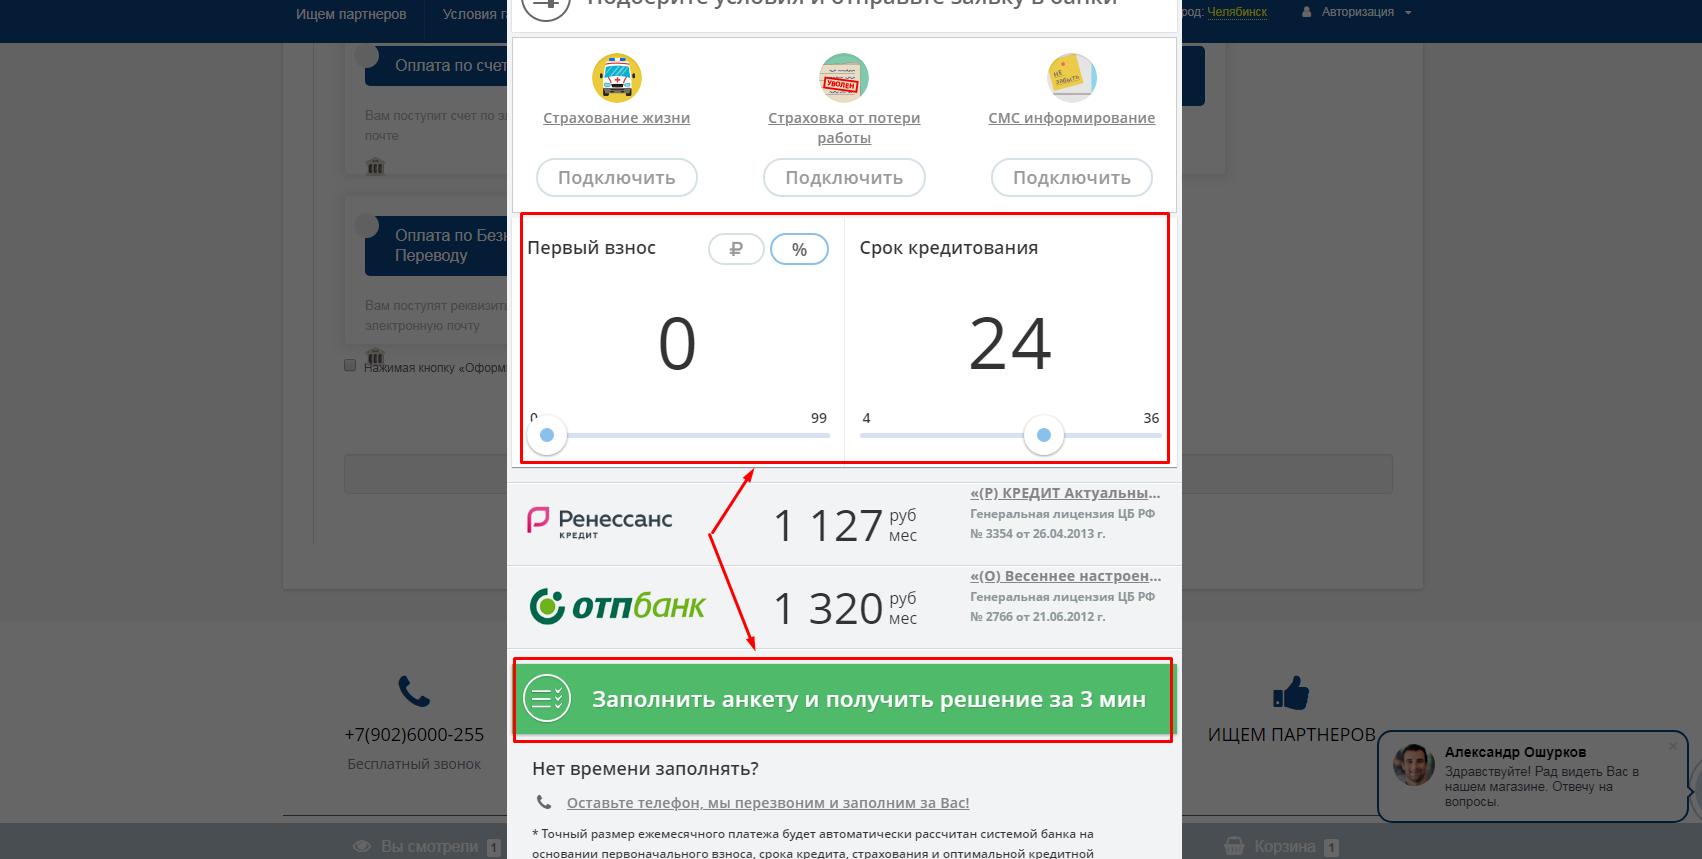 альфа банк кредит для ип онлайн заявка на кредит